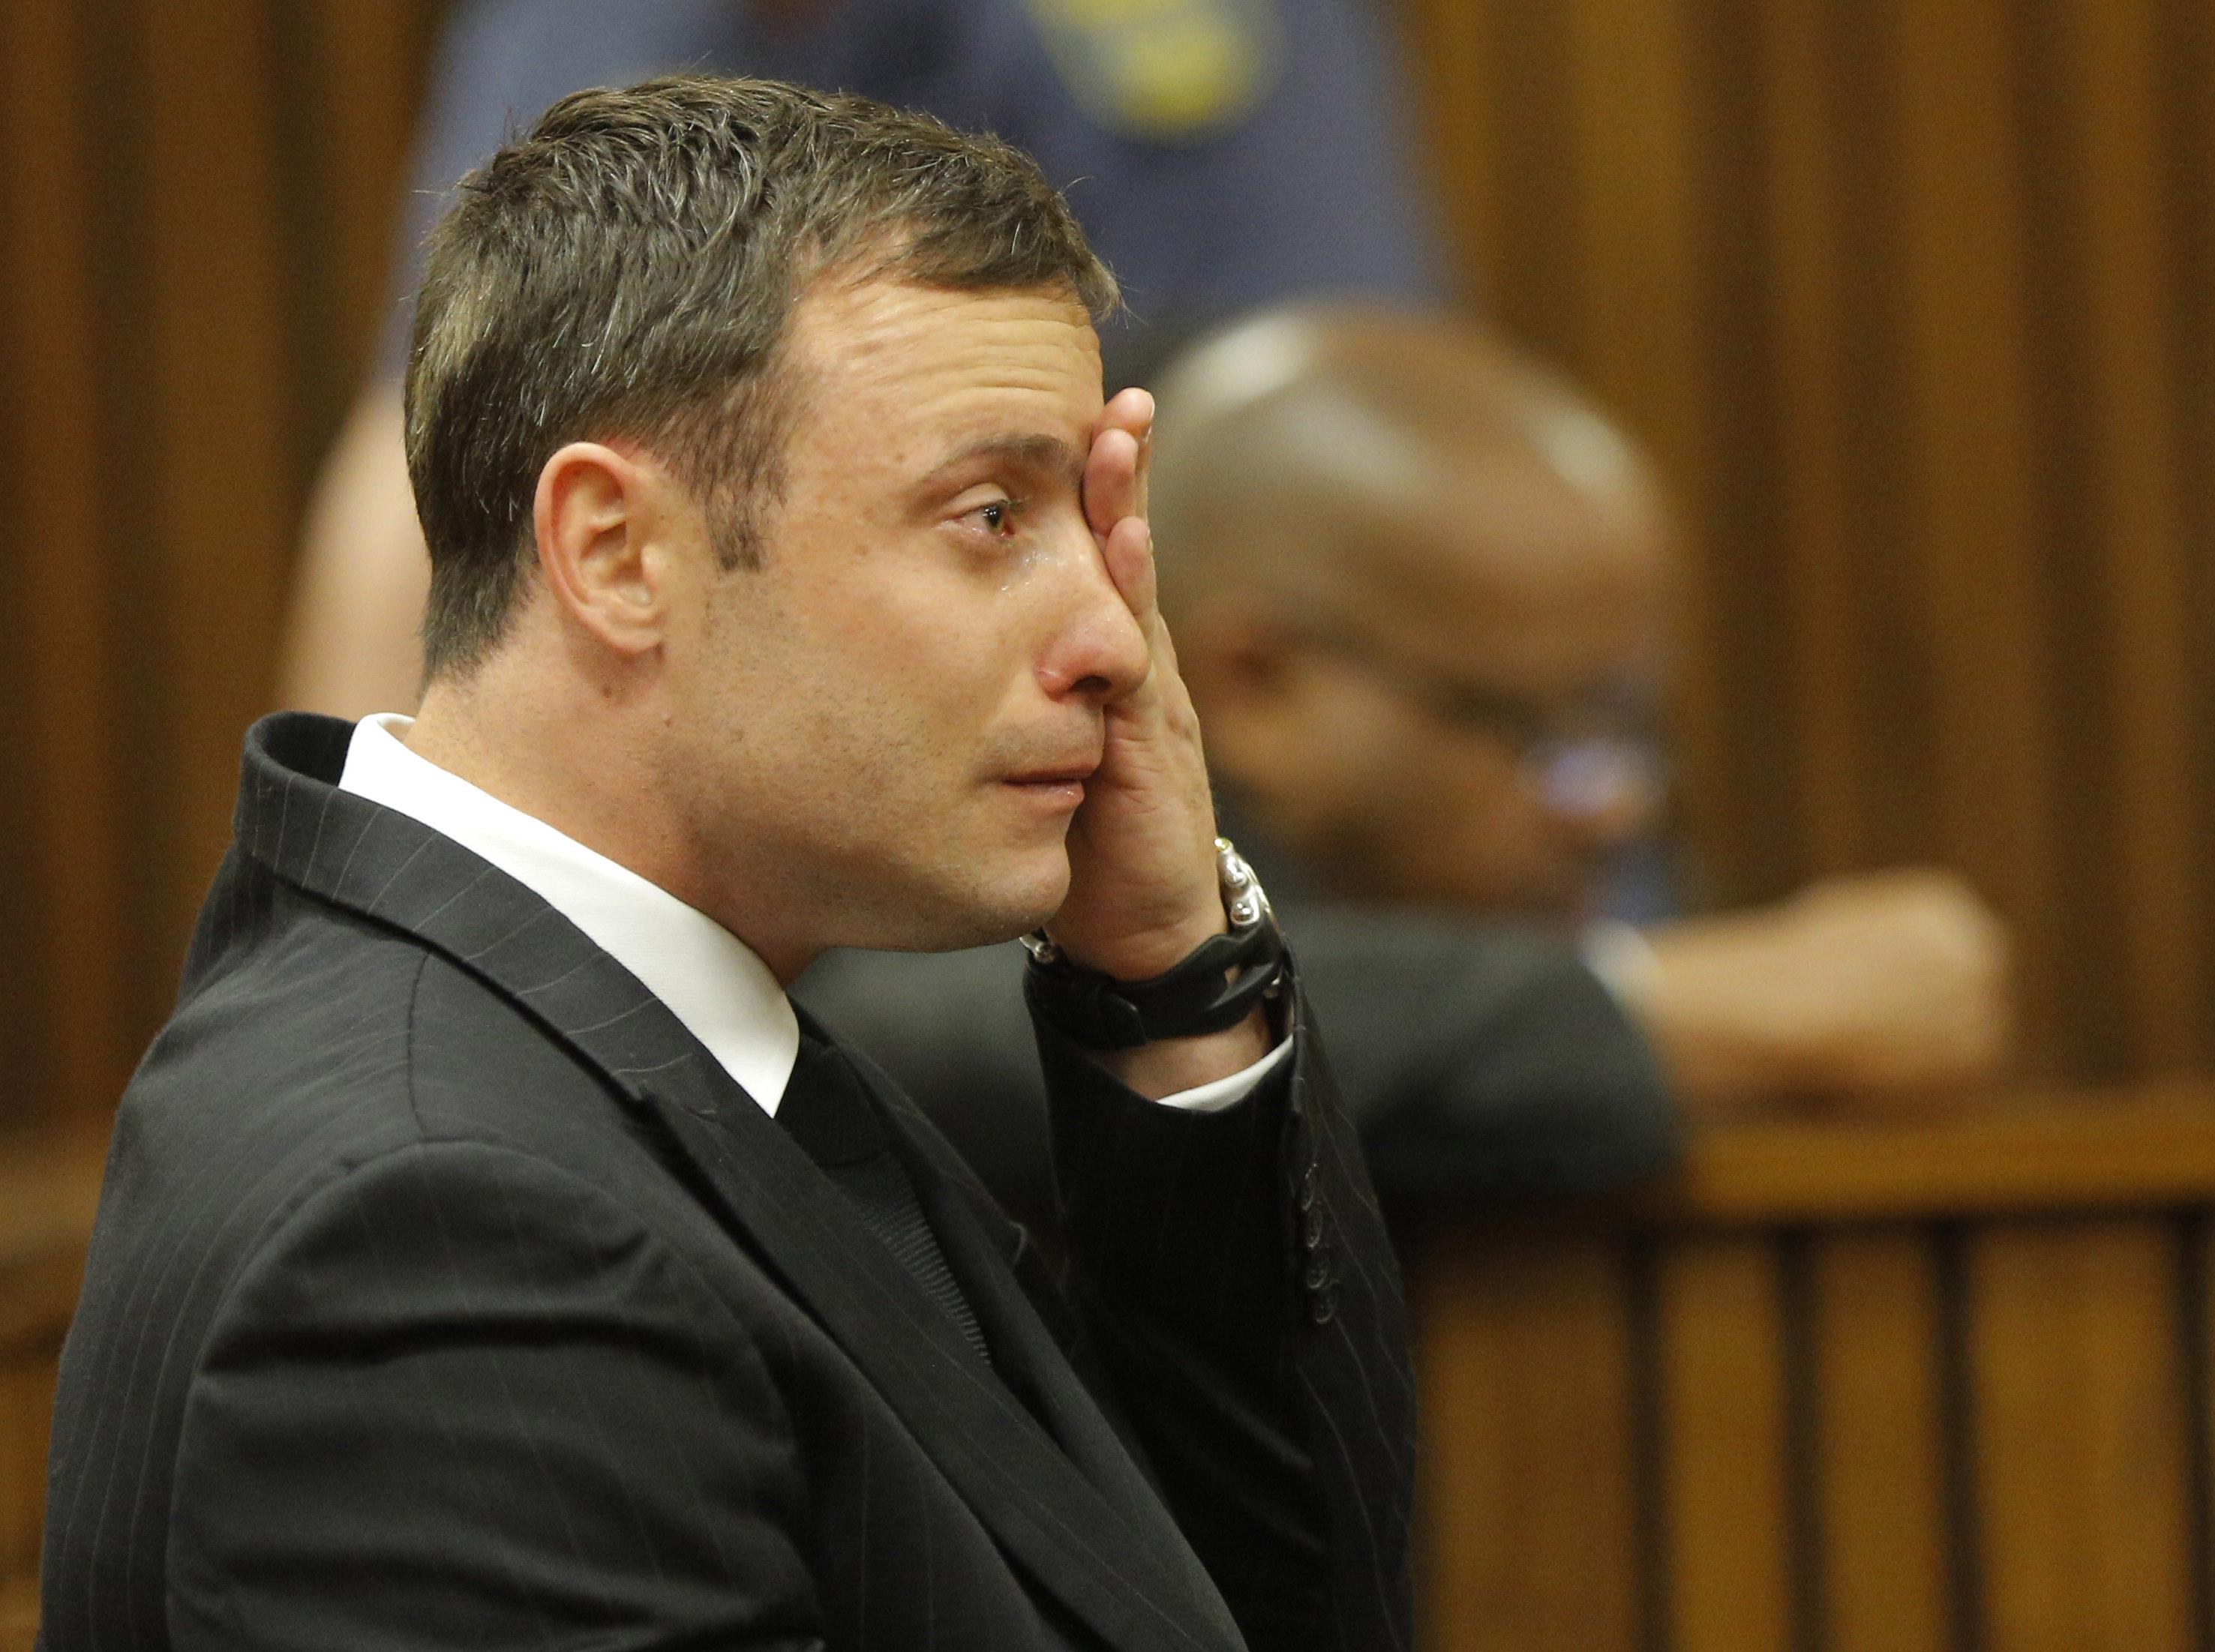 Oscar Pistorius got five years in prison for killing his girlfriend on Valentine's Day 2013.